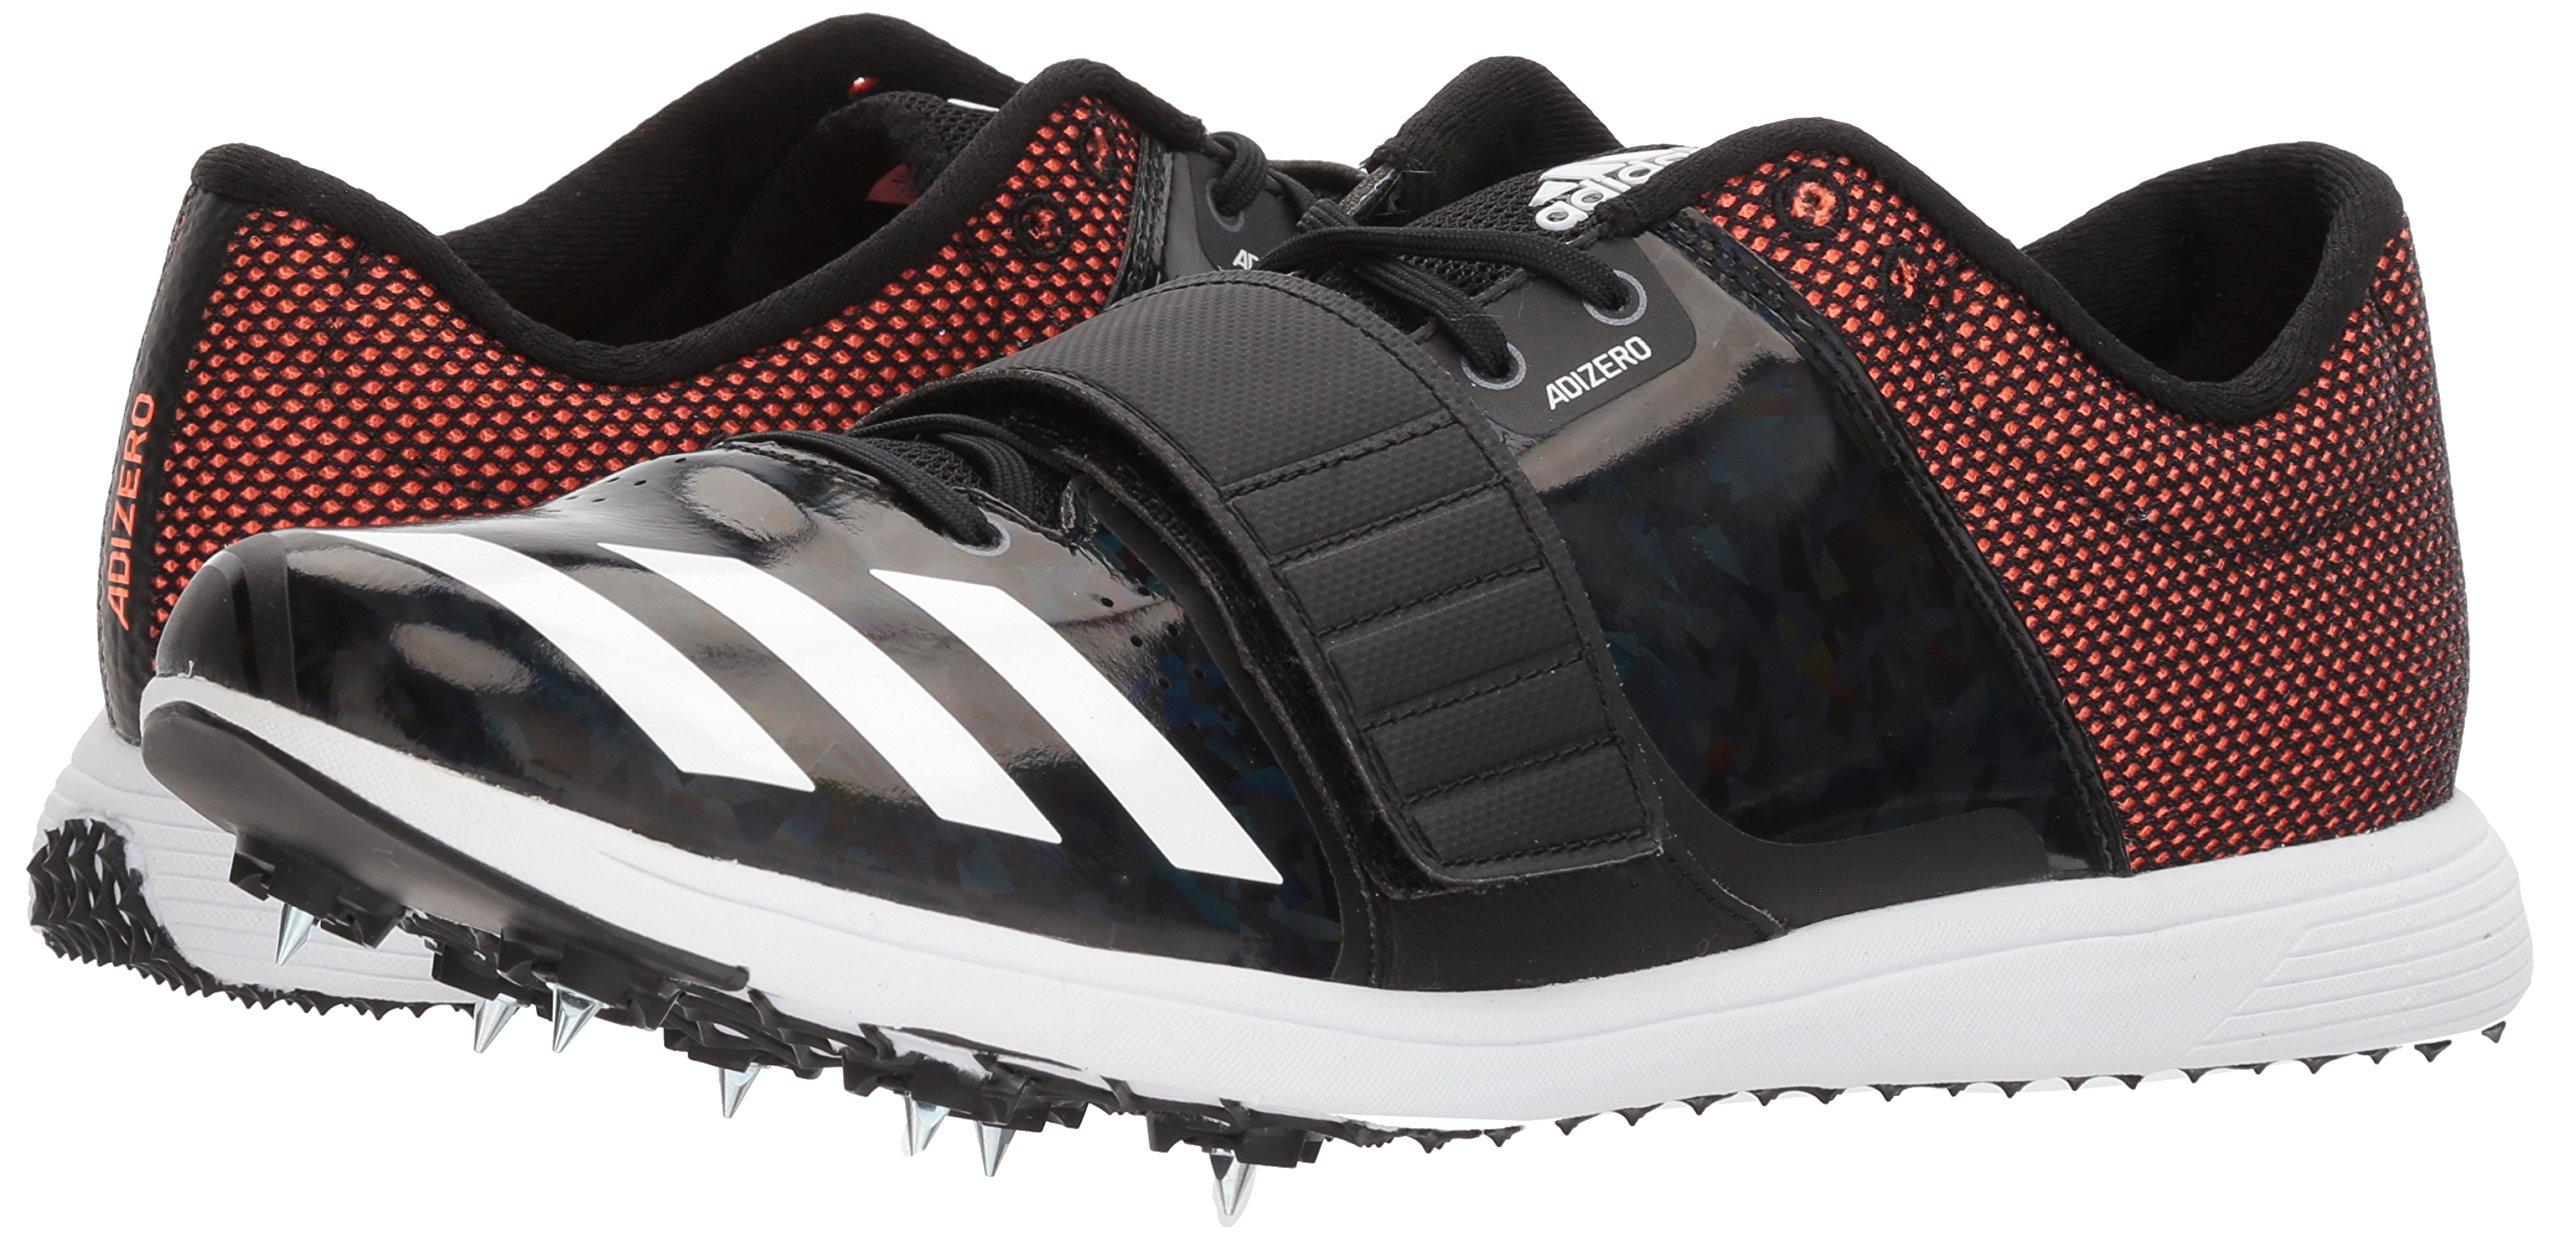 adidas Adizero tj/pv Running Shoe core Black, FTWR White, Orange 13.5 M US by adidas (Image #6)